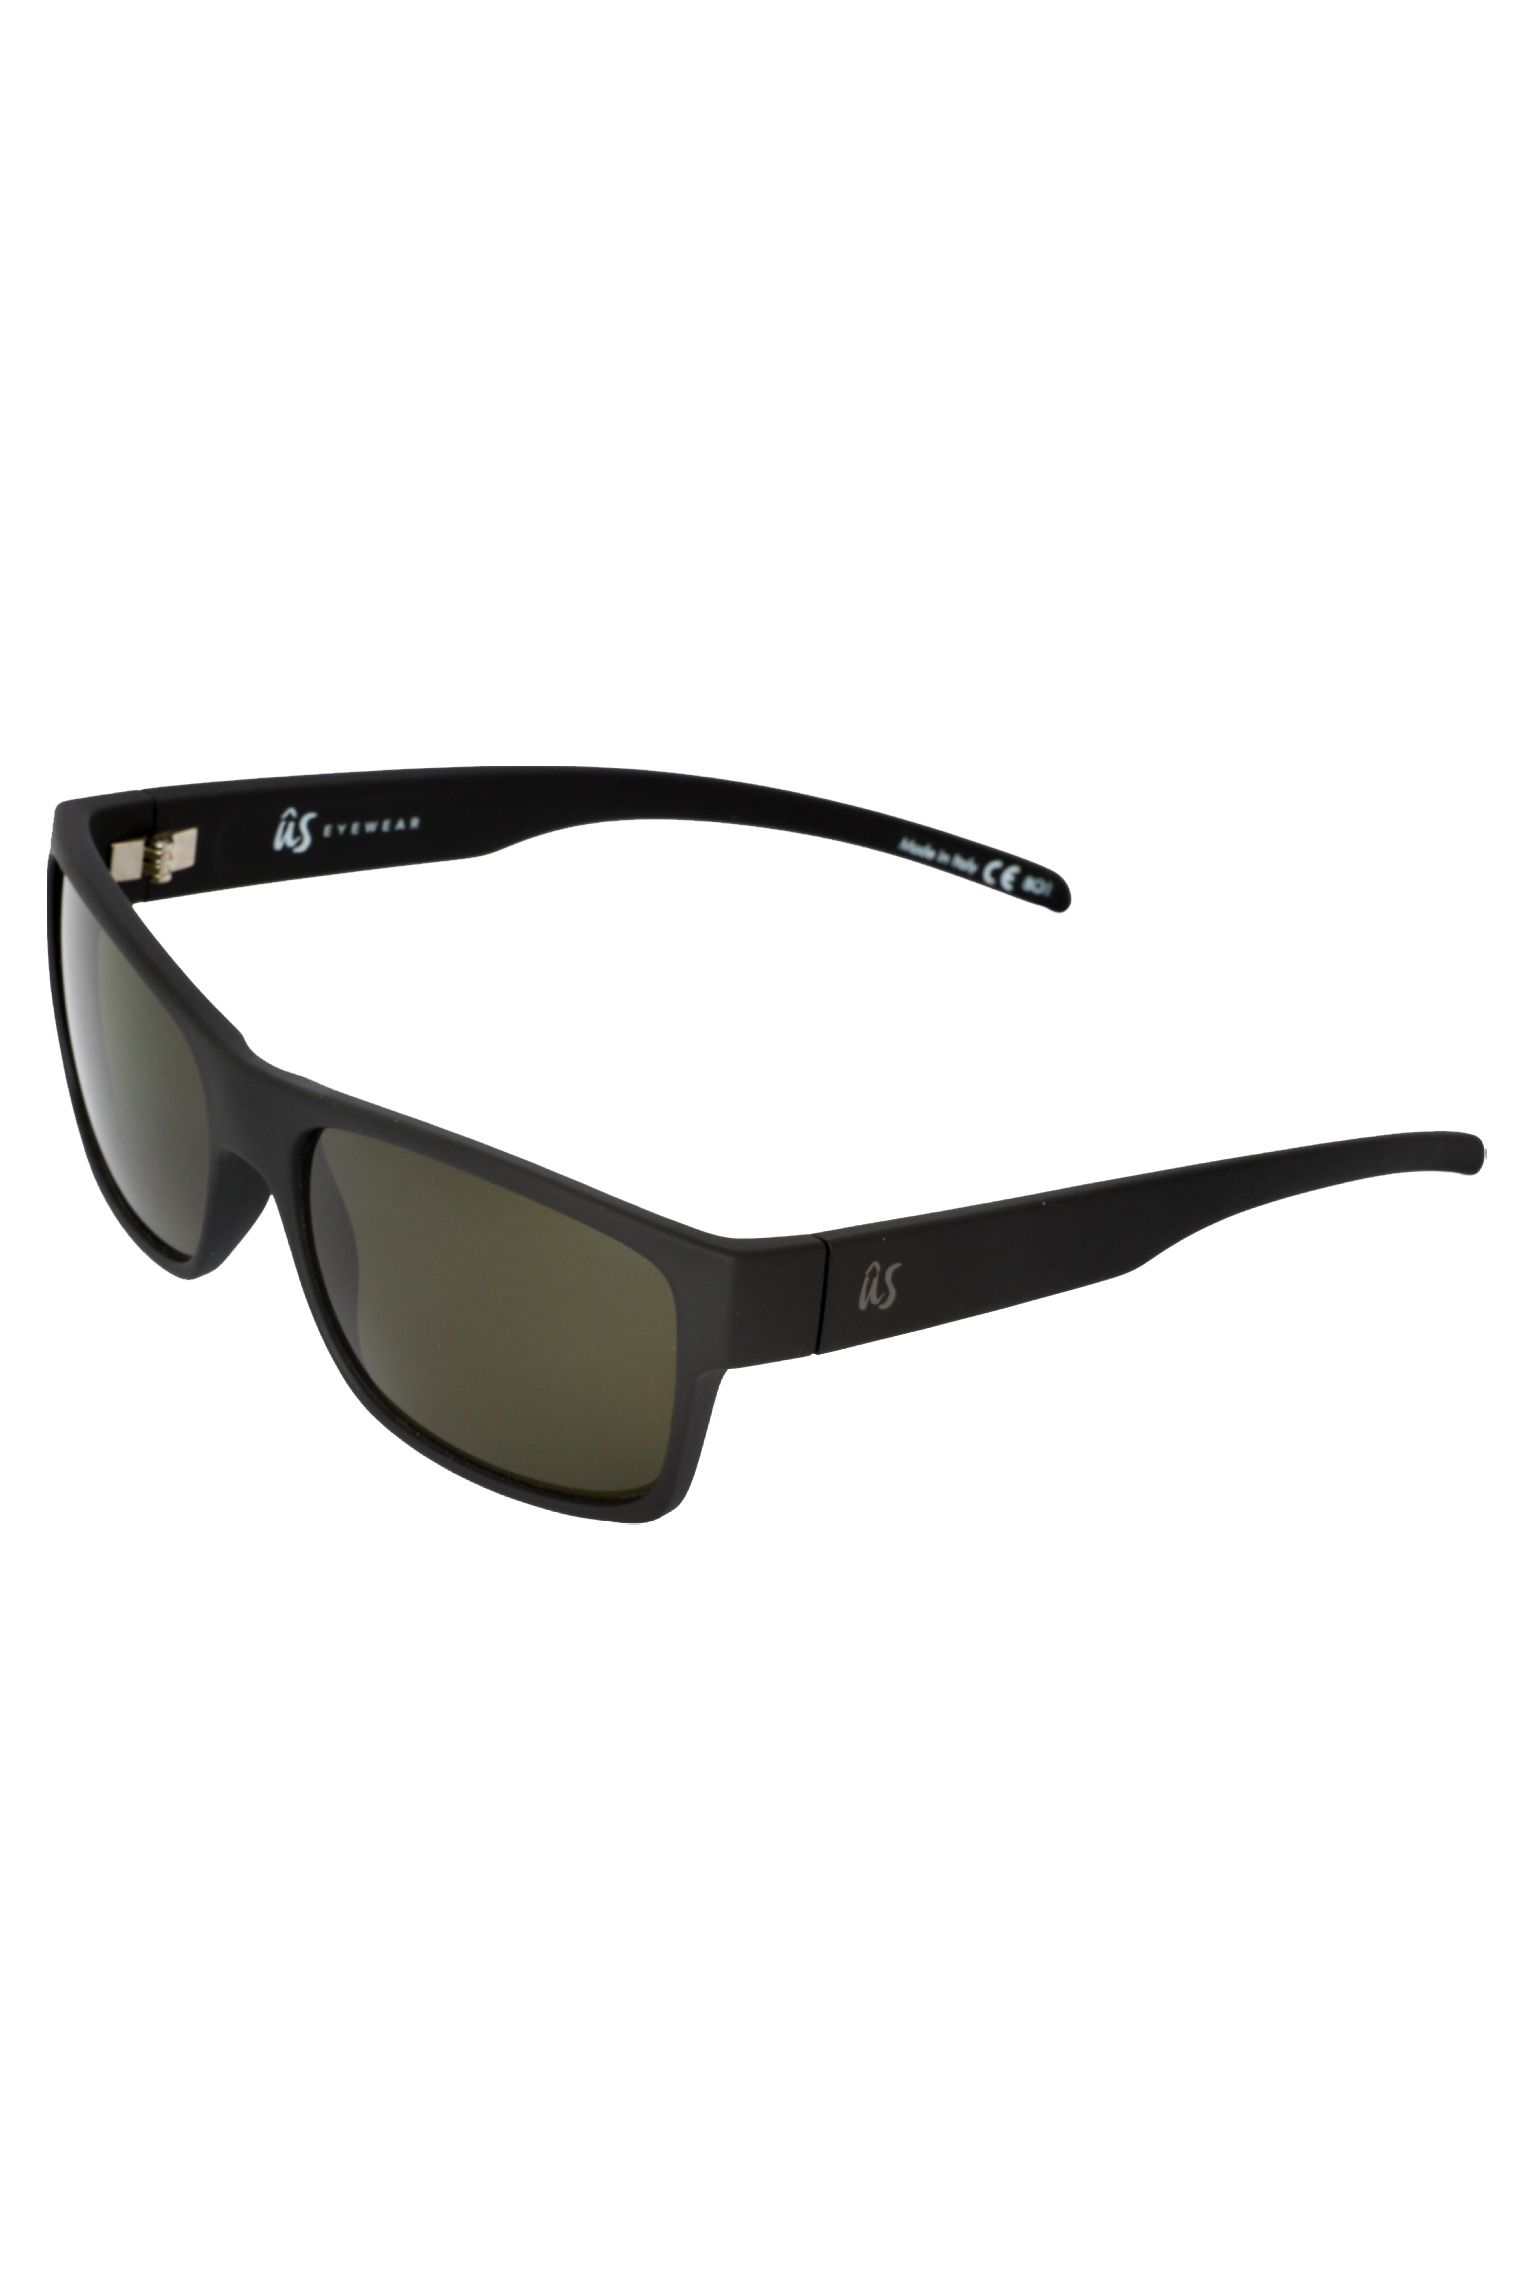 US Sunglasses HELIOS Matte Black/Vintage Grey Polarized